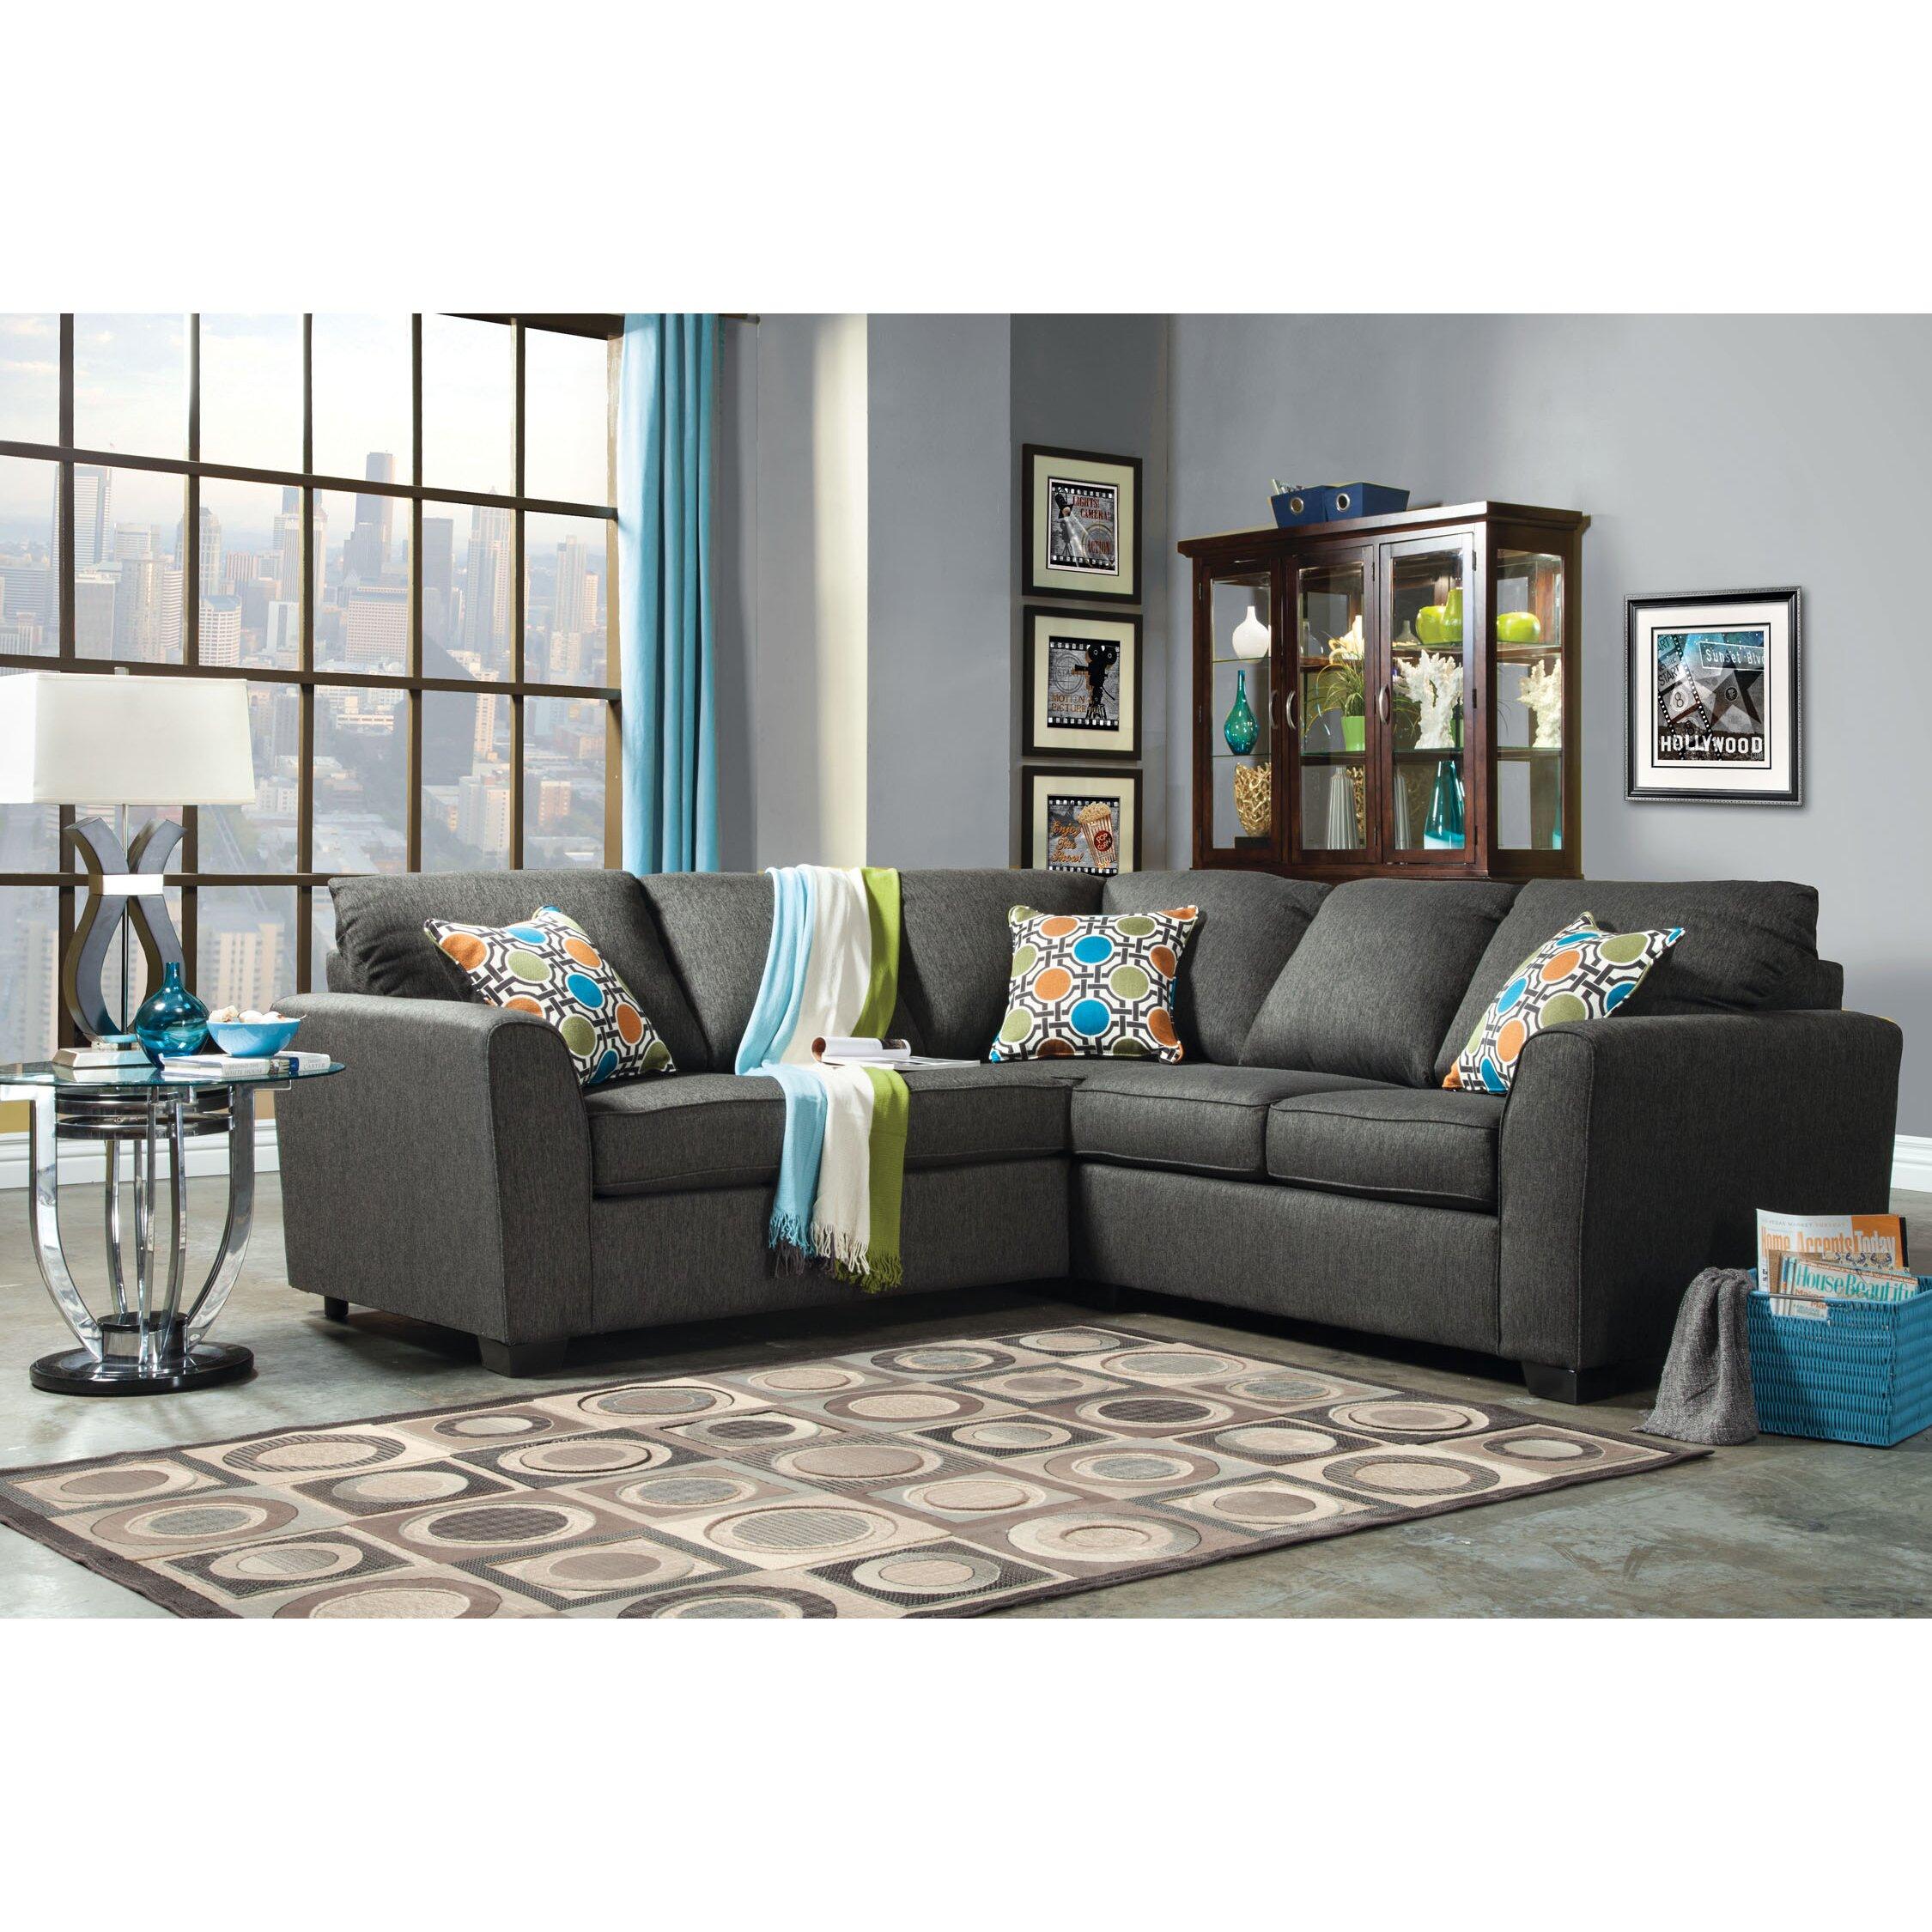 Hokku designs atomic sectional reviews wayfair for Hokku designs living room furniture